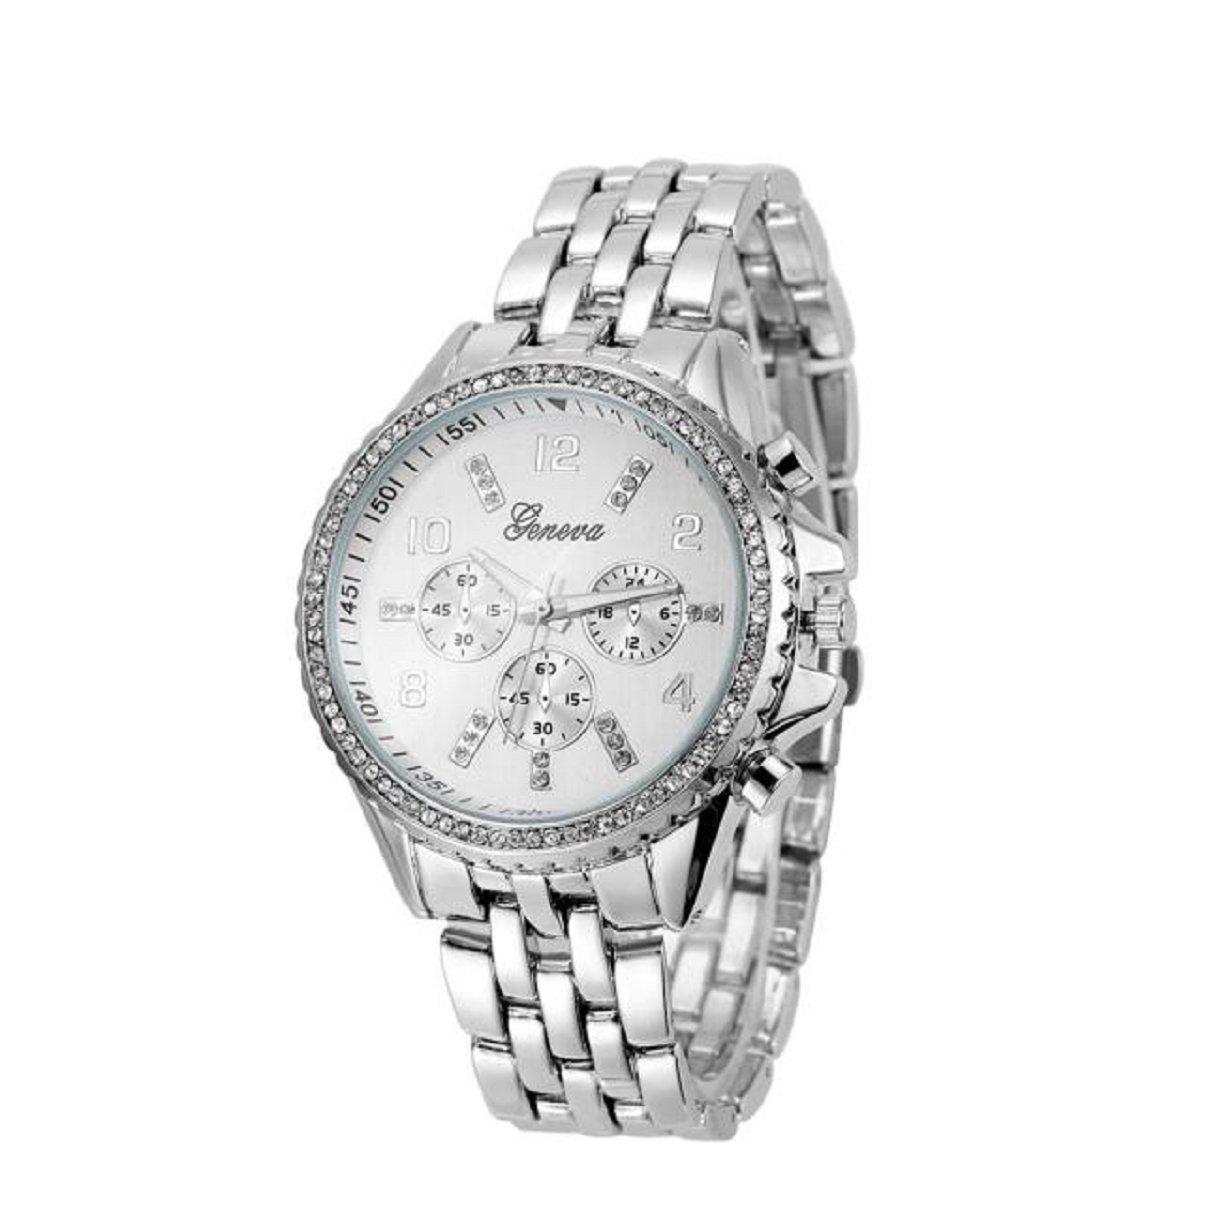 Geneva Lookatool® Fashion Classic Luxury Stainless Steel Quartz Analog Wrist Watch